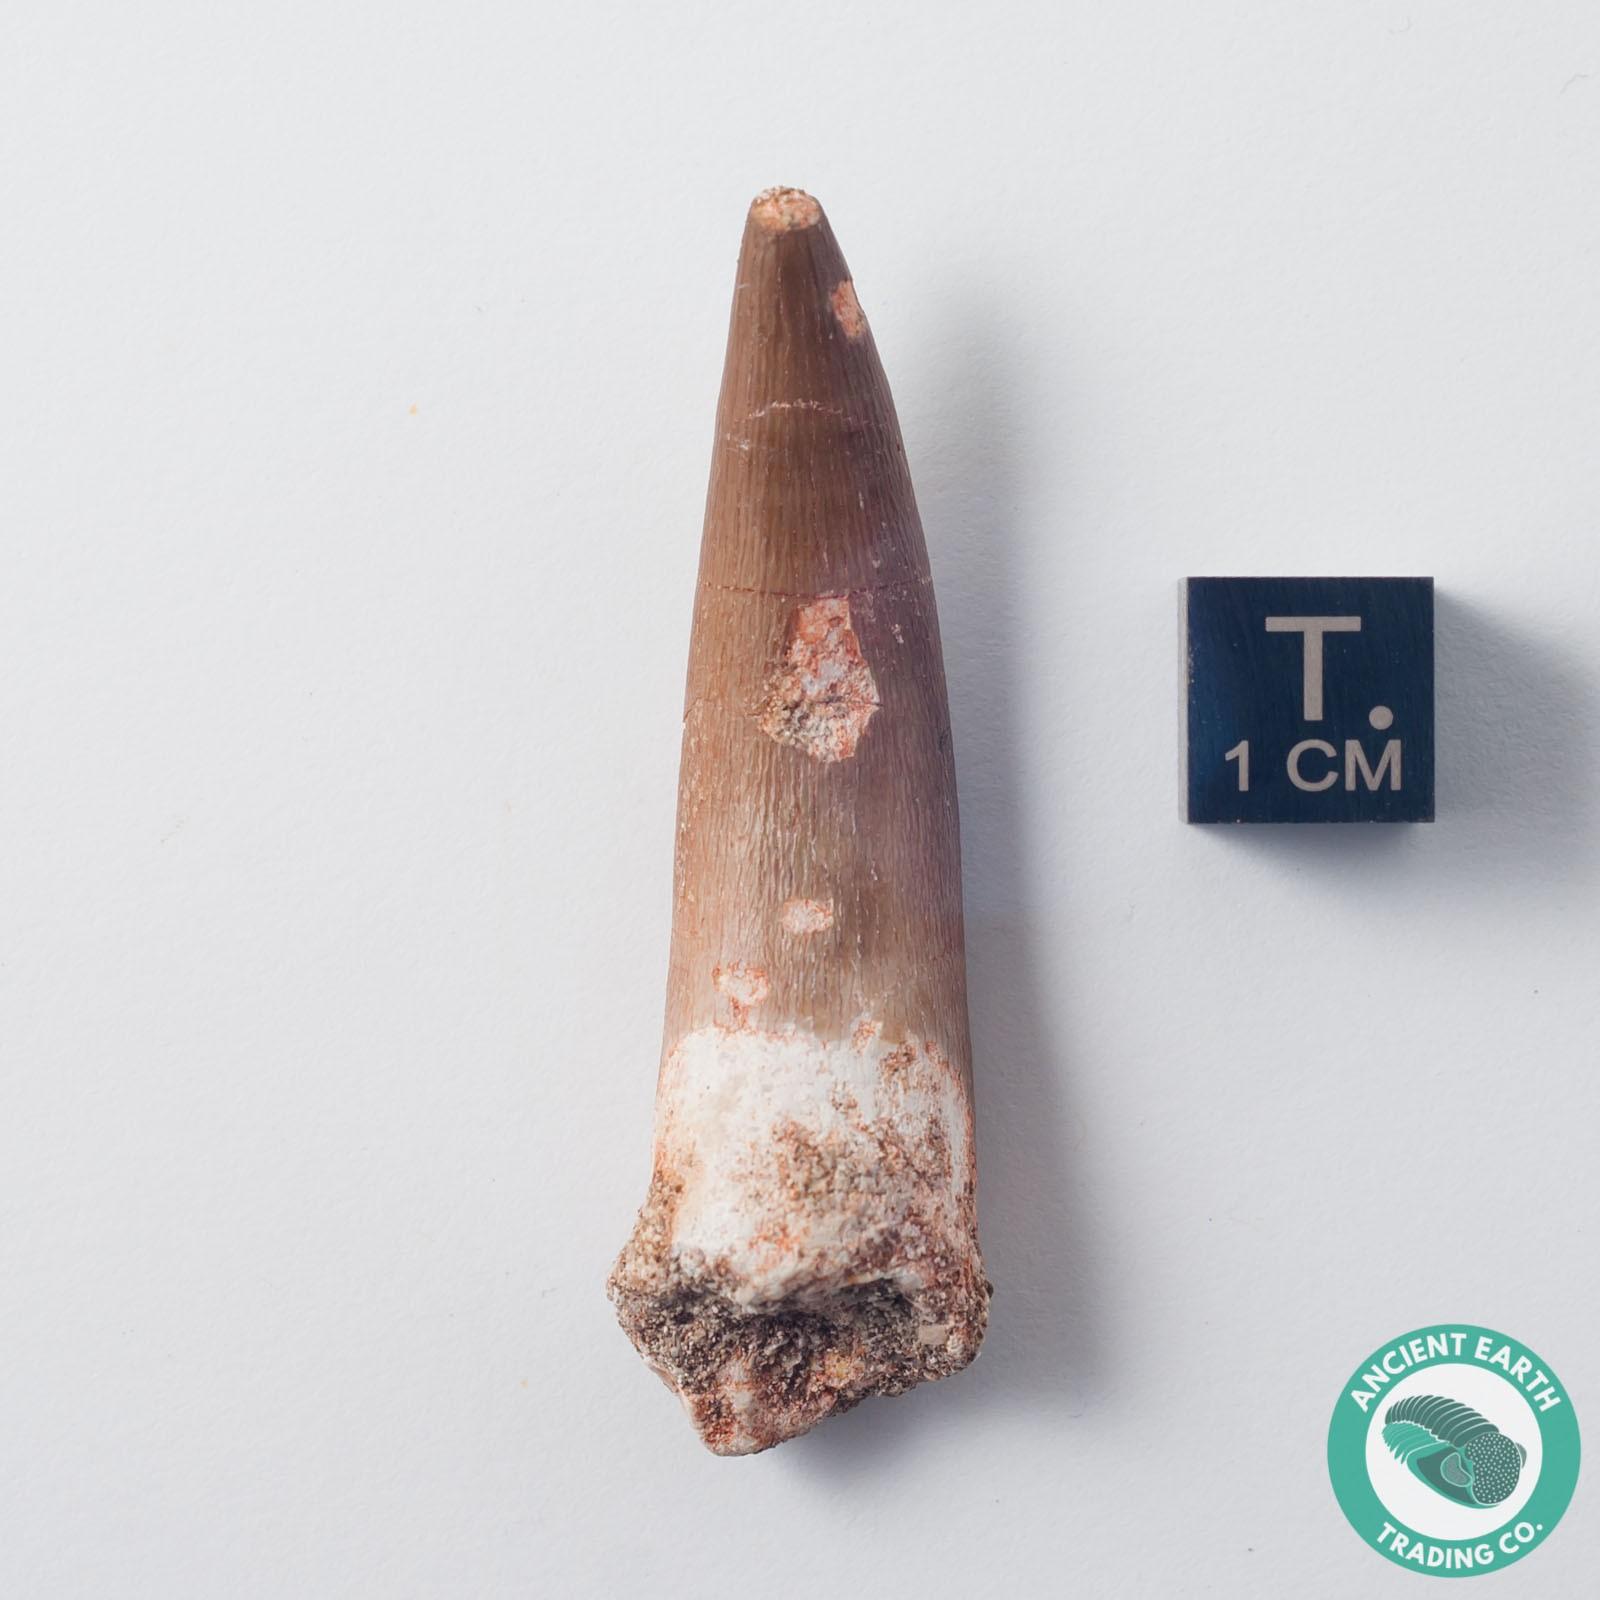 2.06 in. Plesiosaur Zarafasaura Fossil Tooth - Morocco